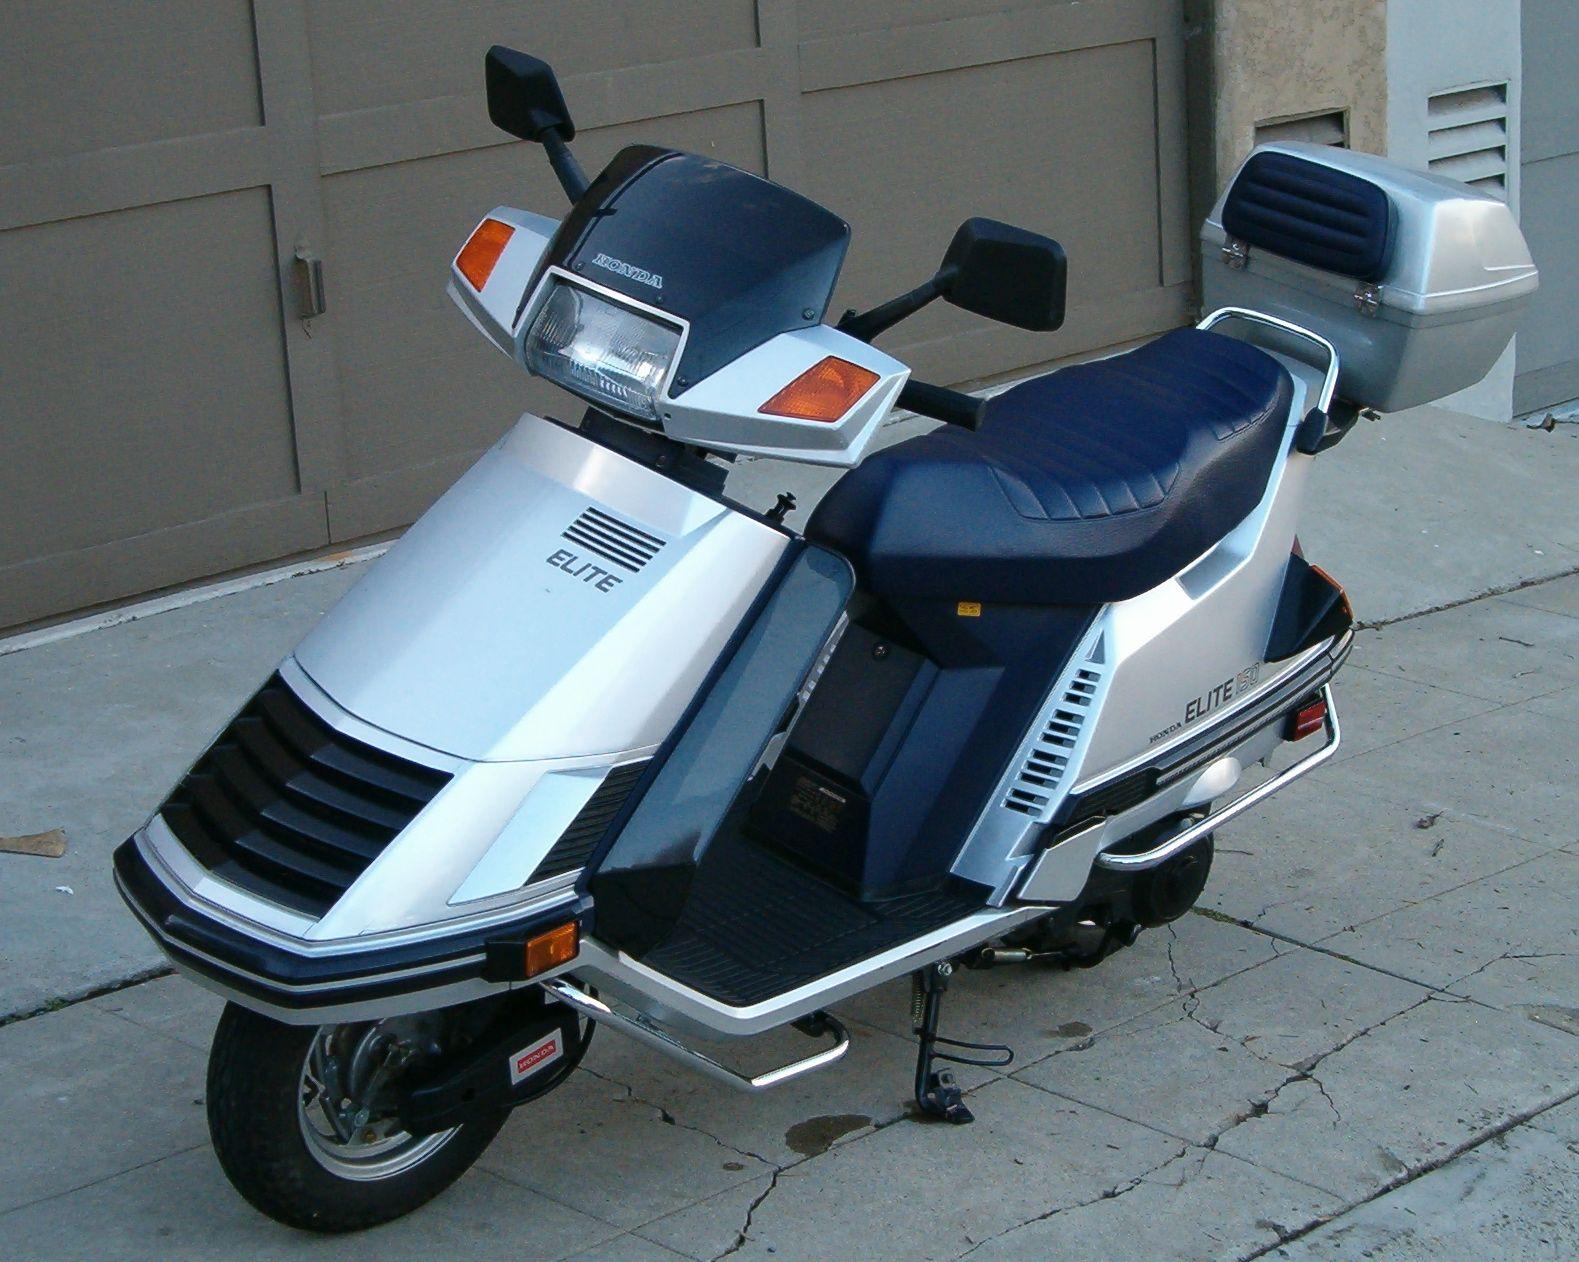 honda elite 125 150 motor scooter guide accessories. Black Bedroom Furniture Sets. Home Design Ideas